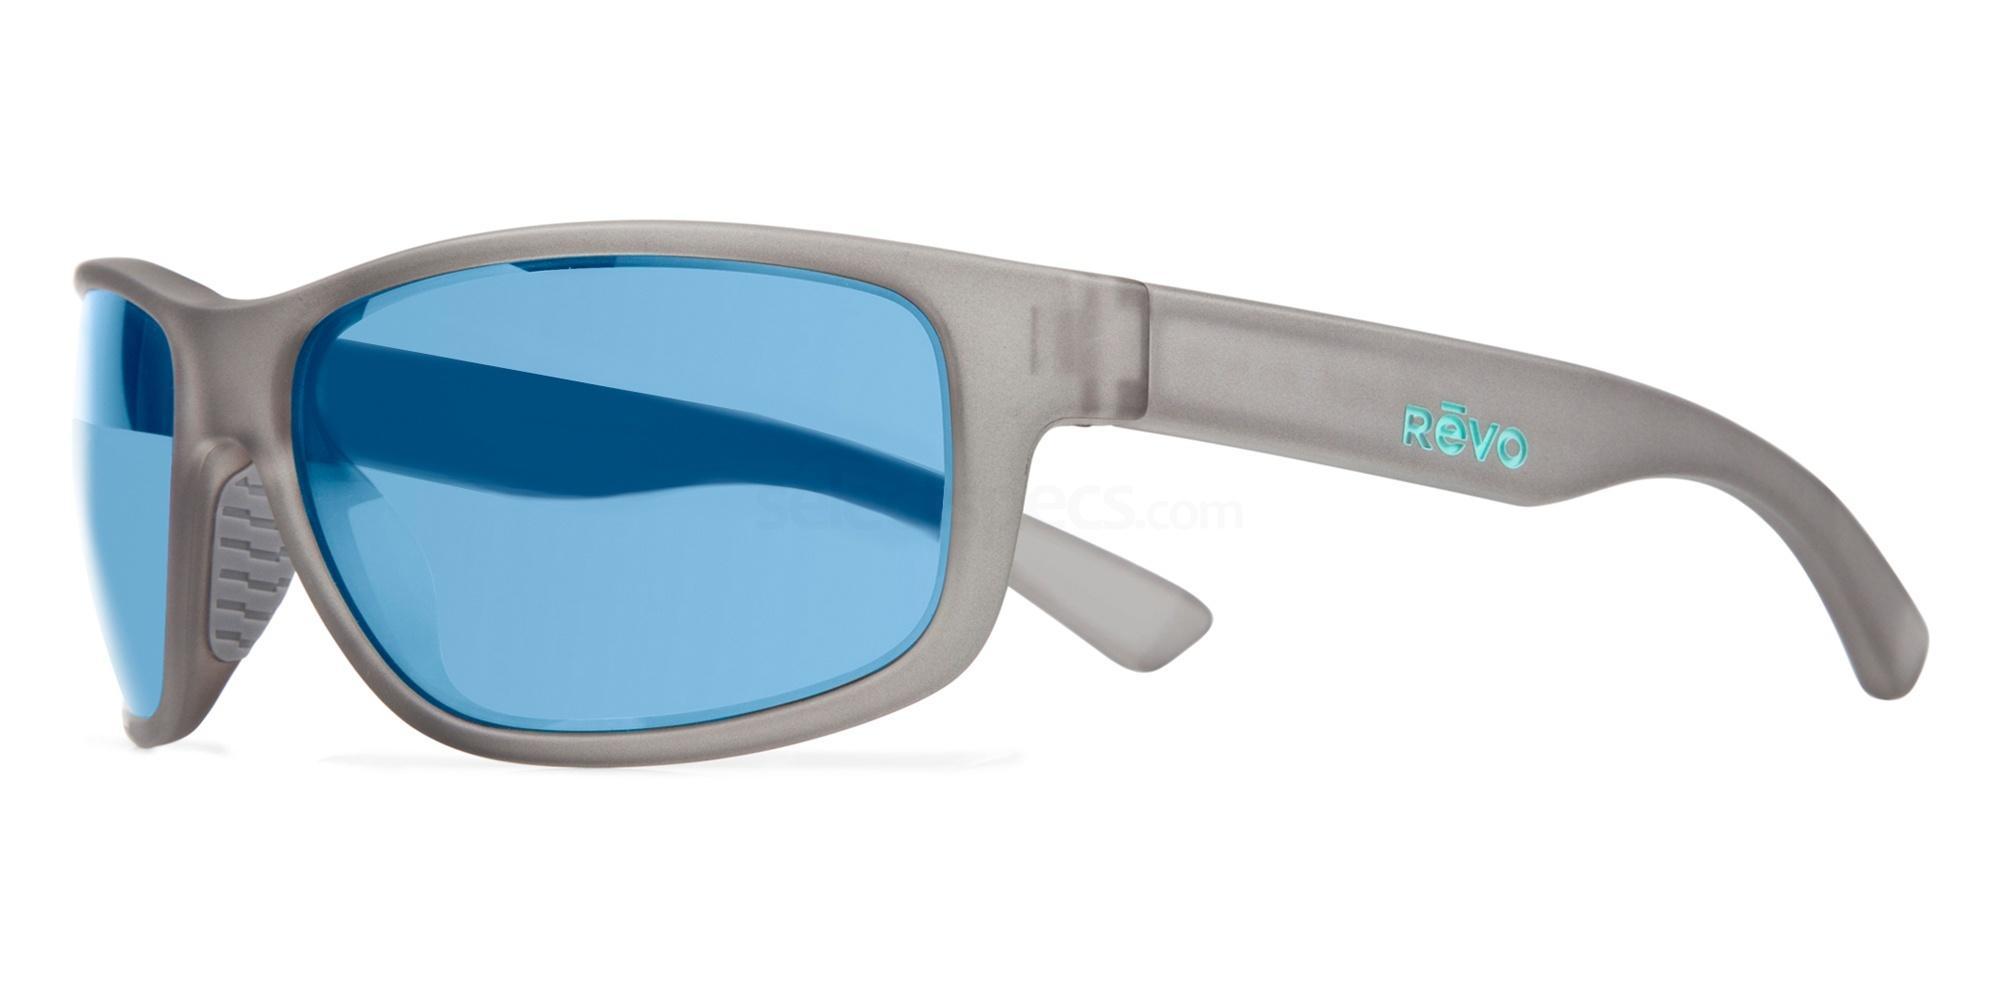 00BL Baseliner - 351006 Sunglasses, Revo